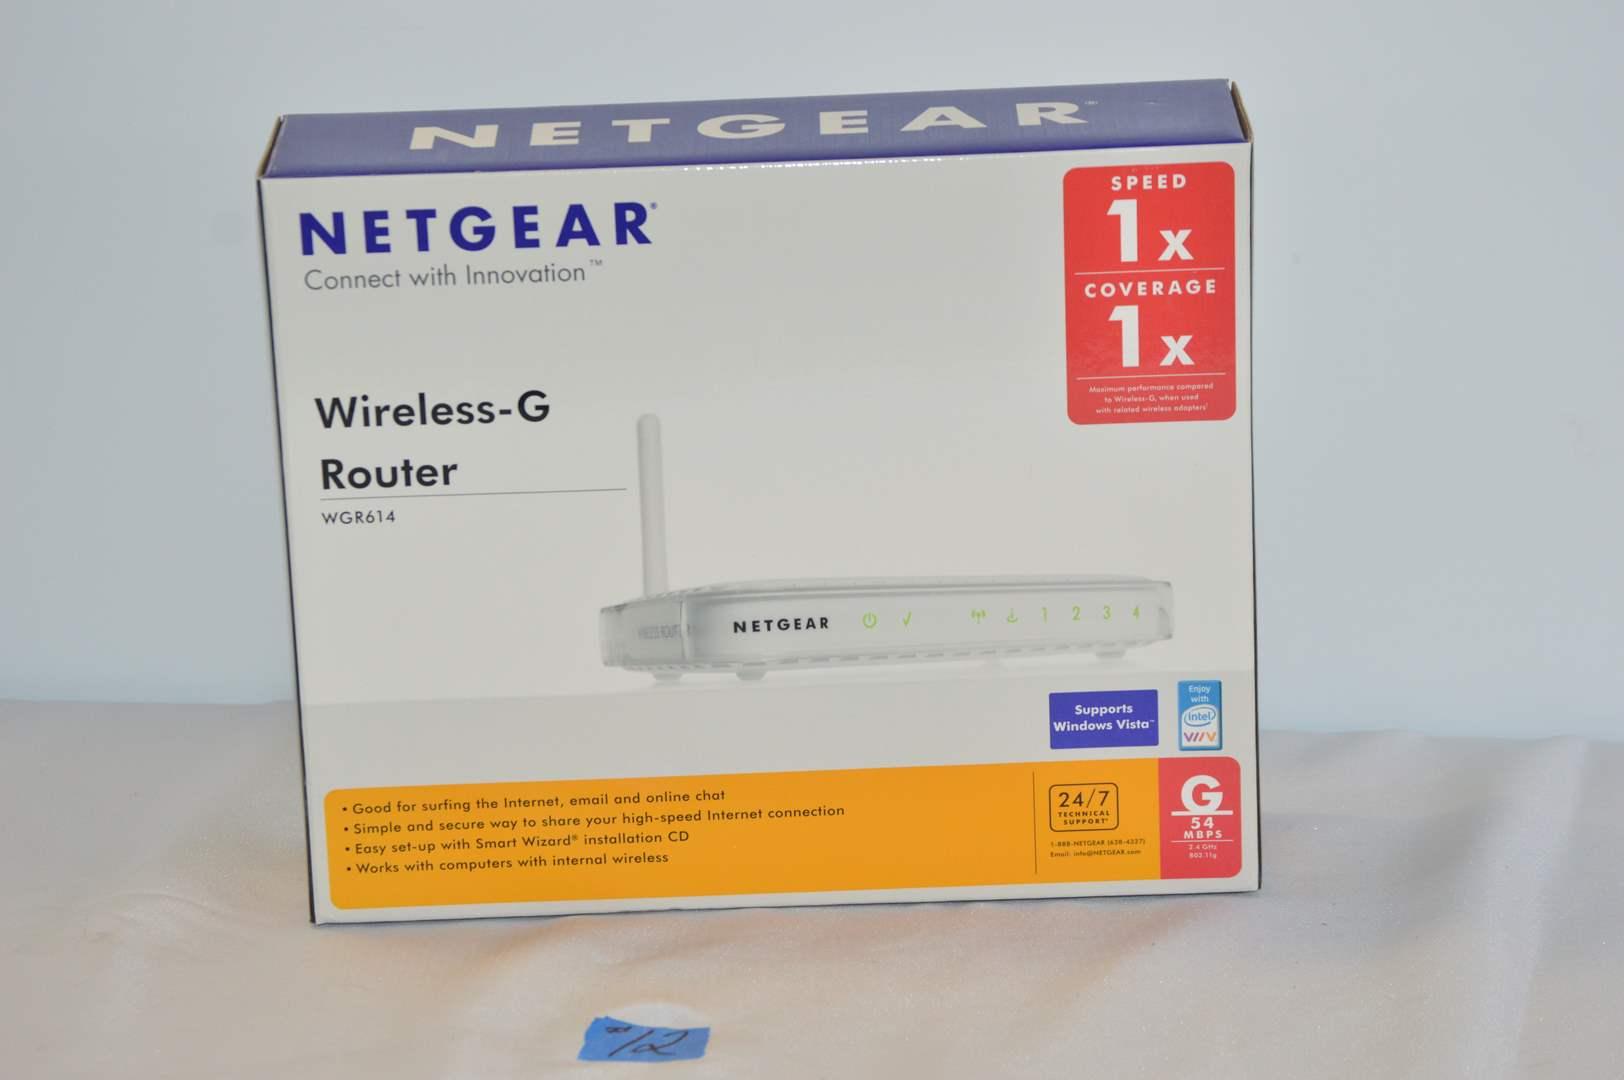 Lot # 12 Netgear wireless-G router (main image)